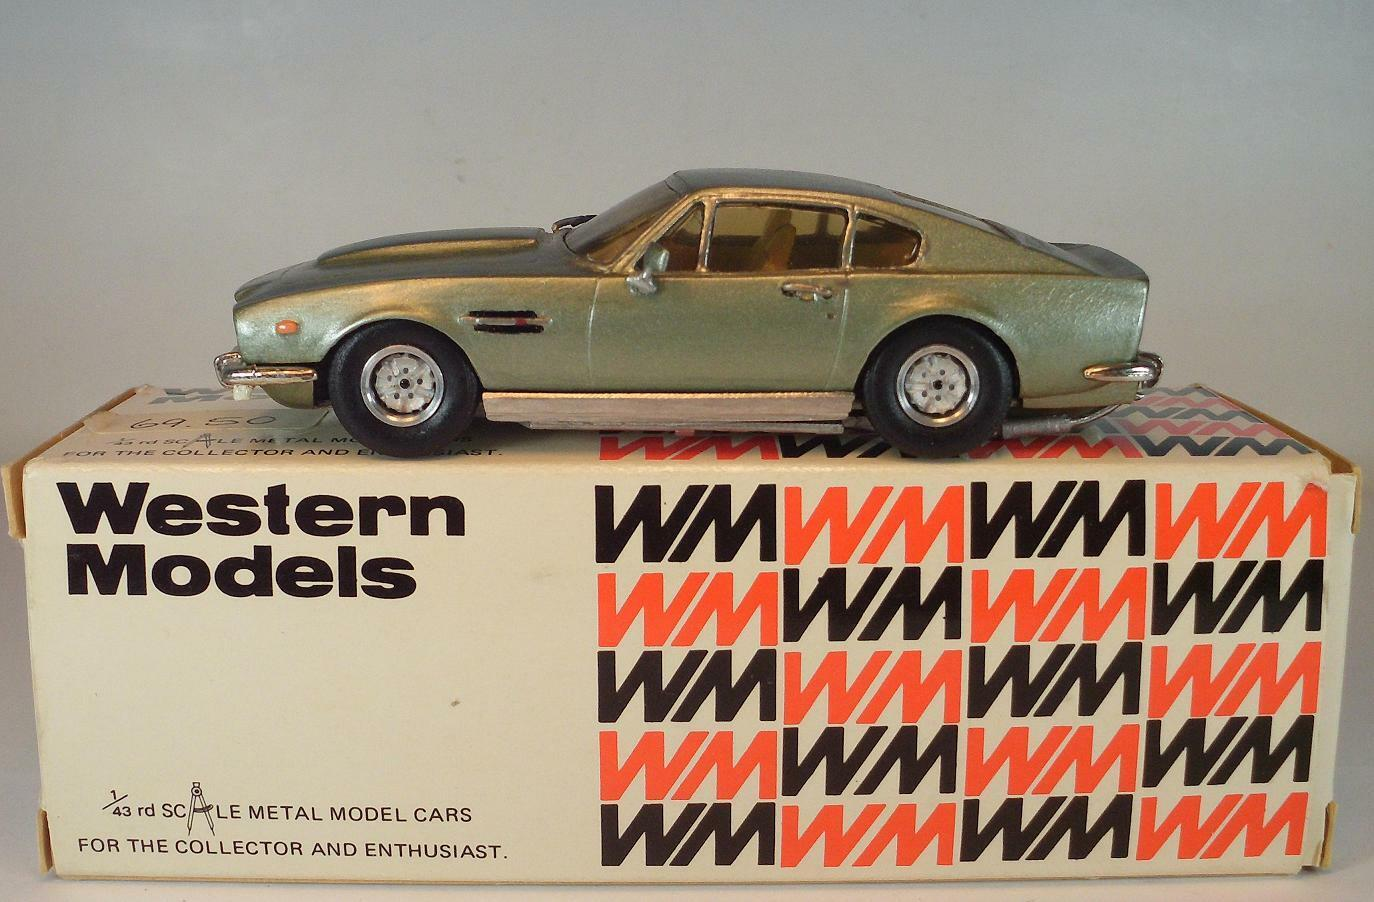 Western ModelllS 1 43 no WP 109 Aston Martin v8 Coupe 1982 OVP